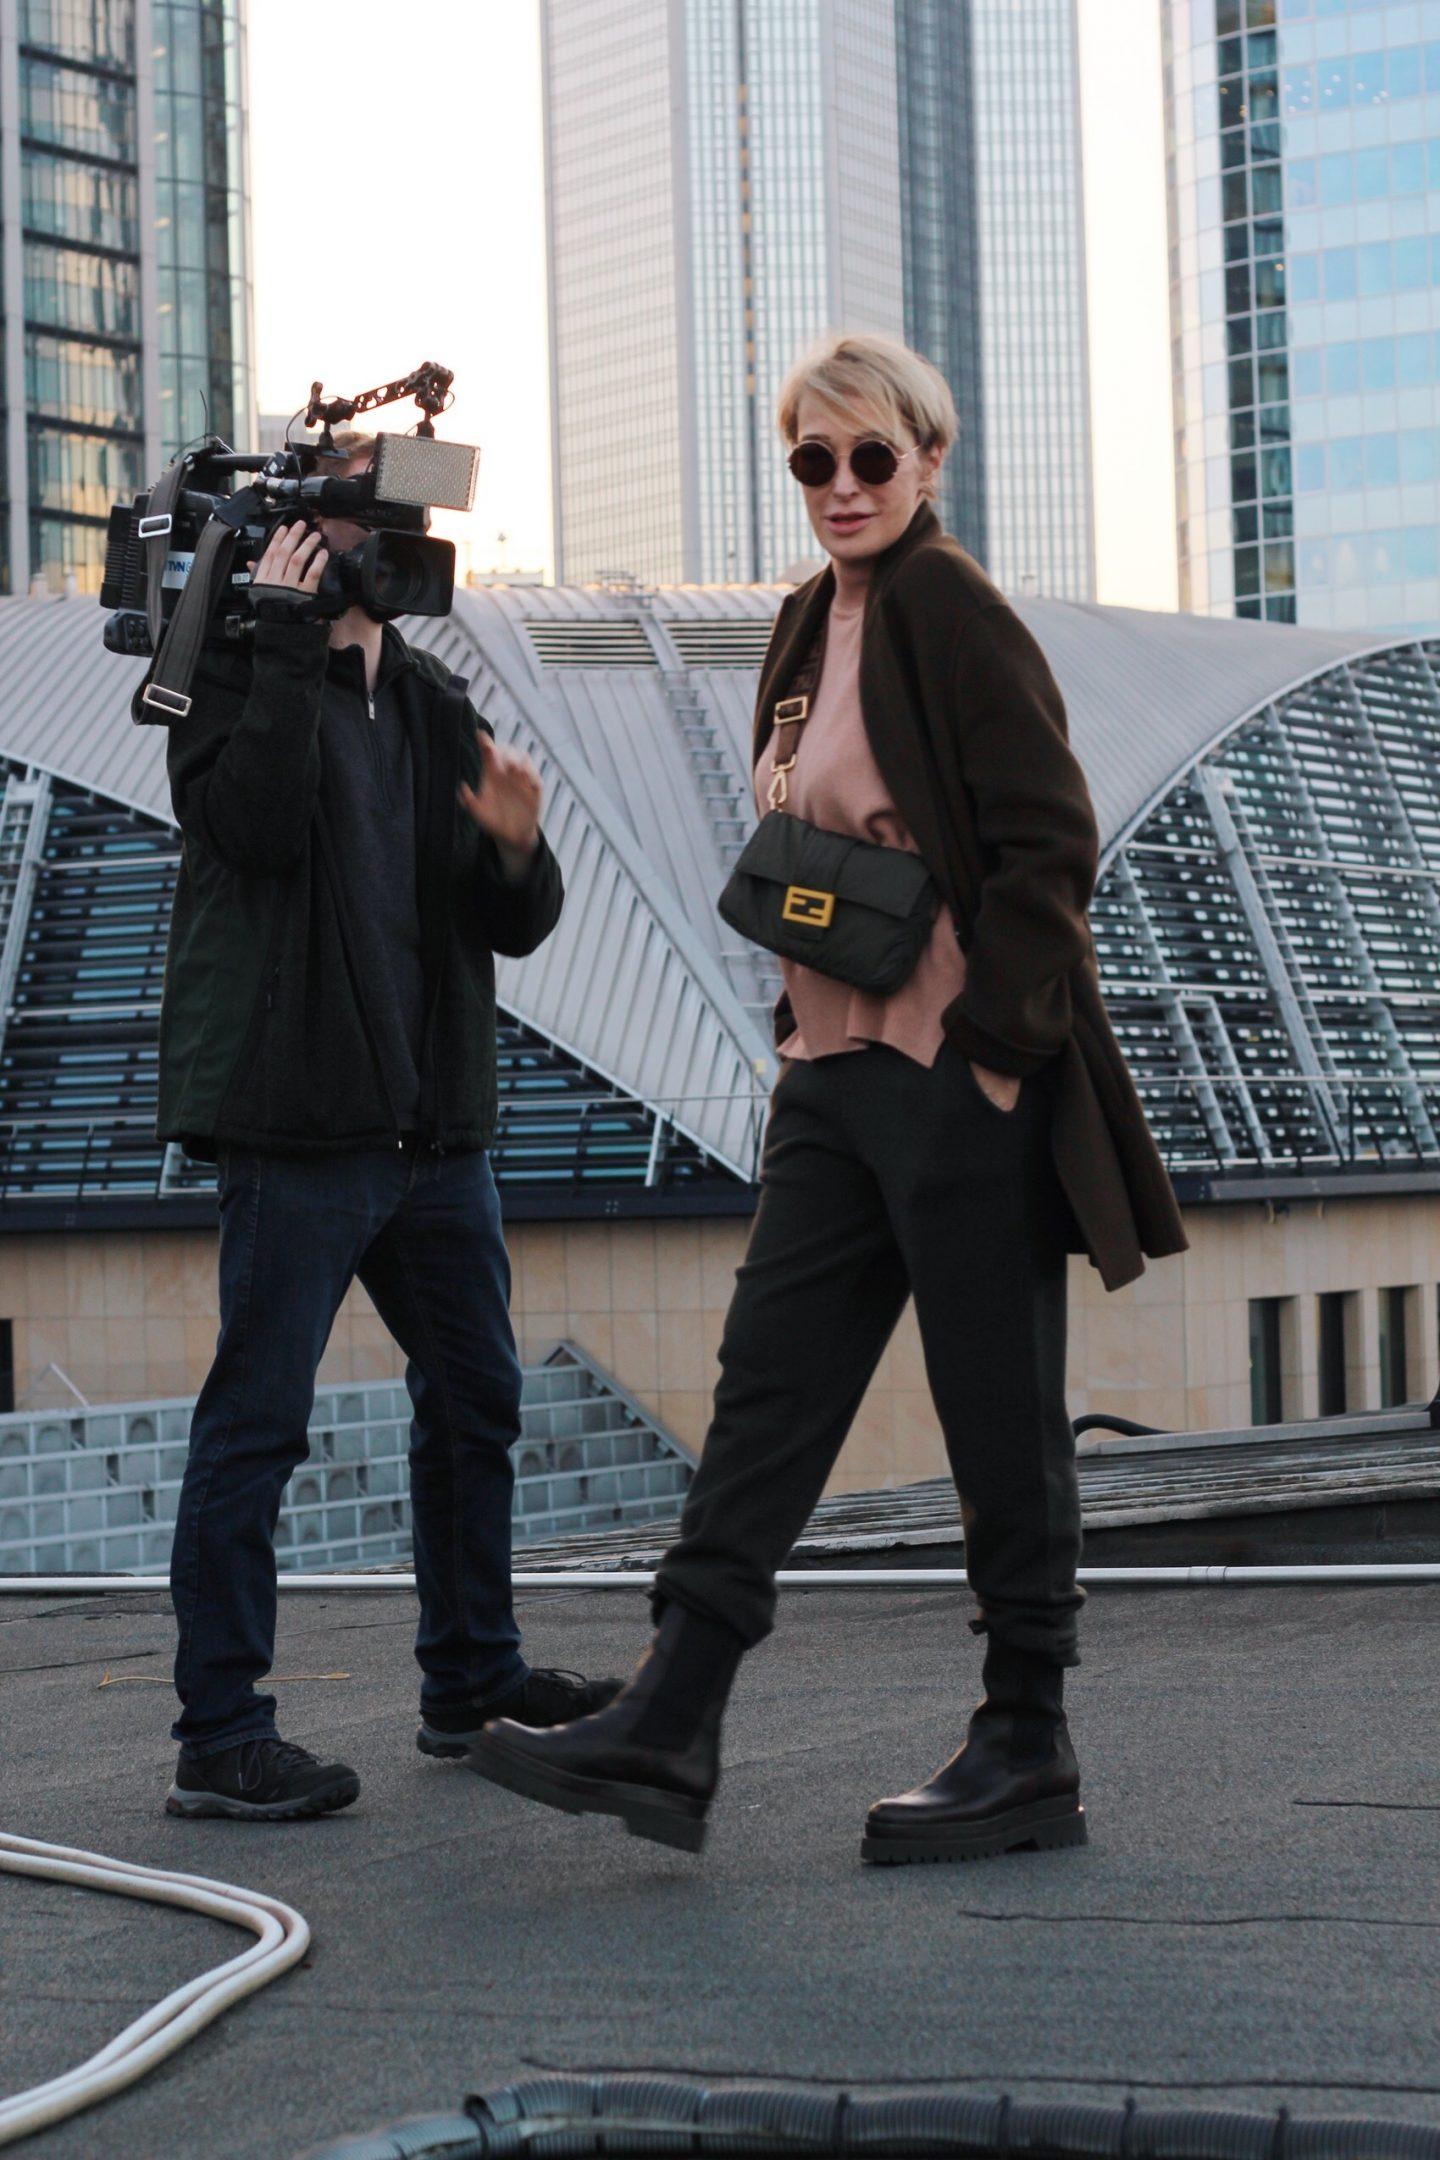 Glamupyourlifestyle goes TV mit RTL Hessen